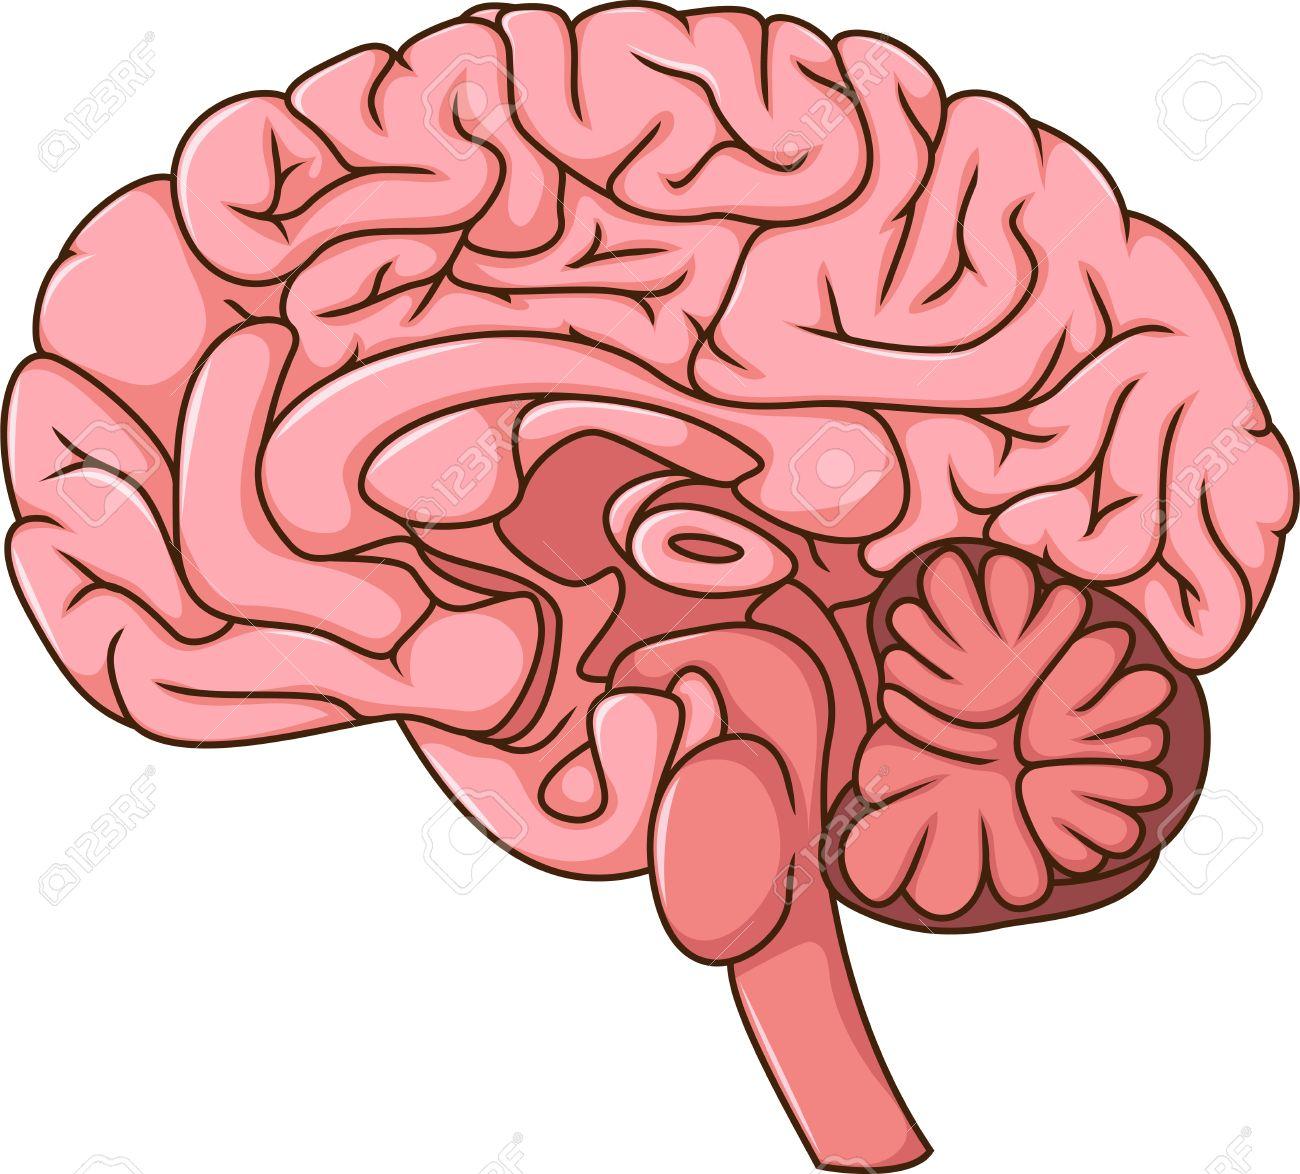 human brain cartoon royalty free cliparts vectors and stock rh 123rf com Brain Clip Art human brain cartoon images